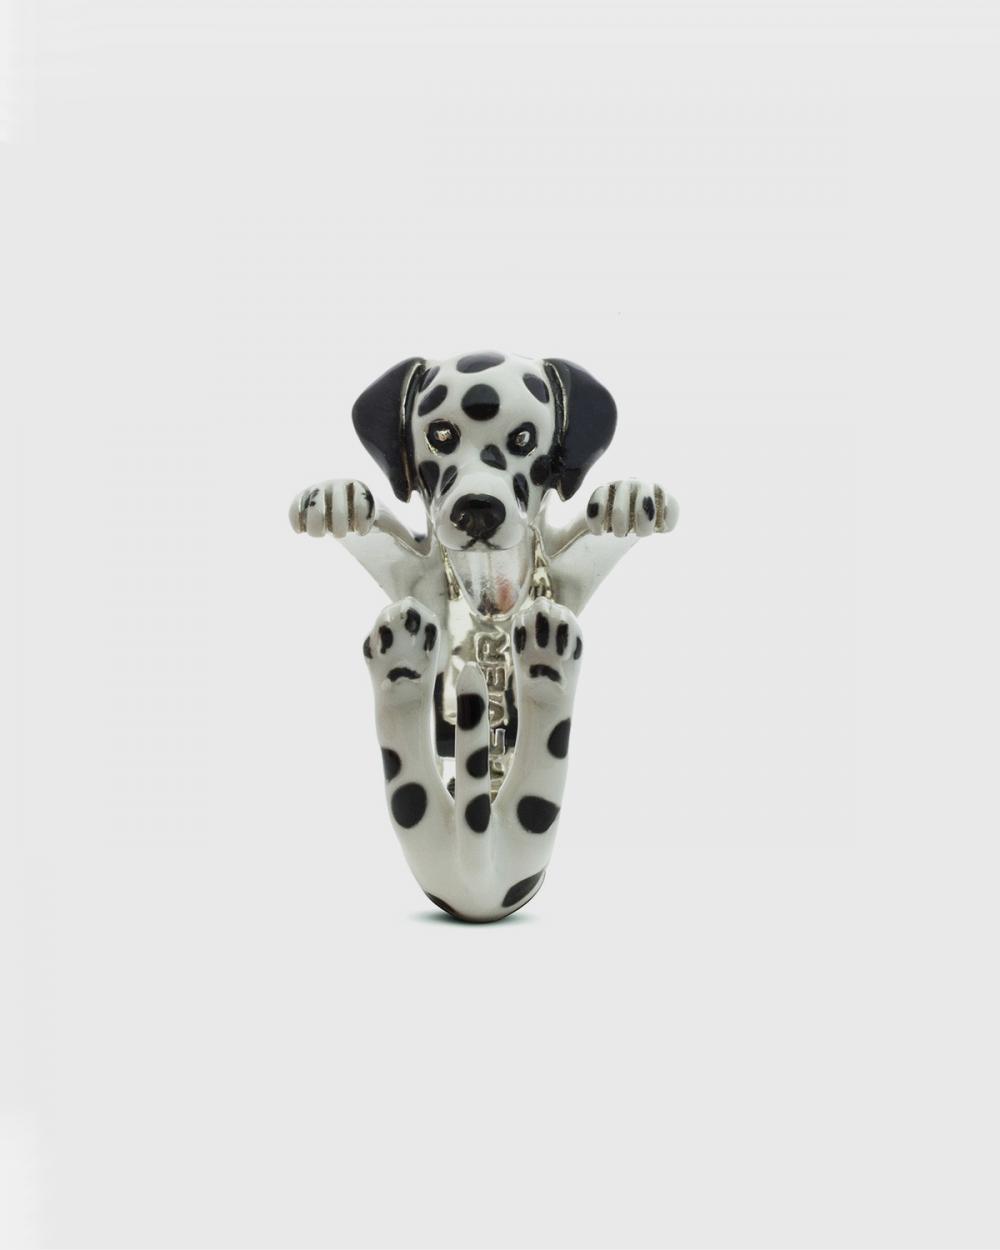 Dog Fever DALMATIAN HUG RING / ENAMELLED NOVE25